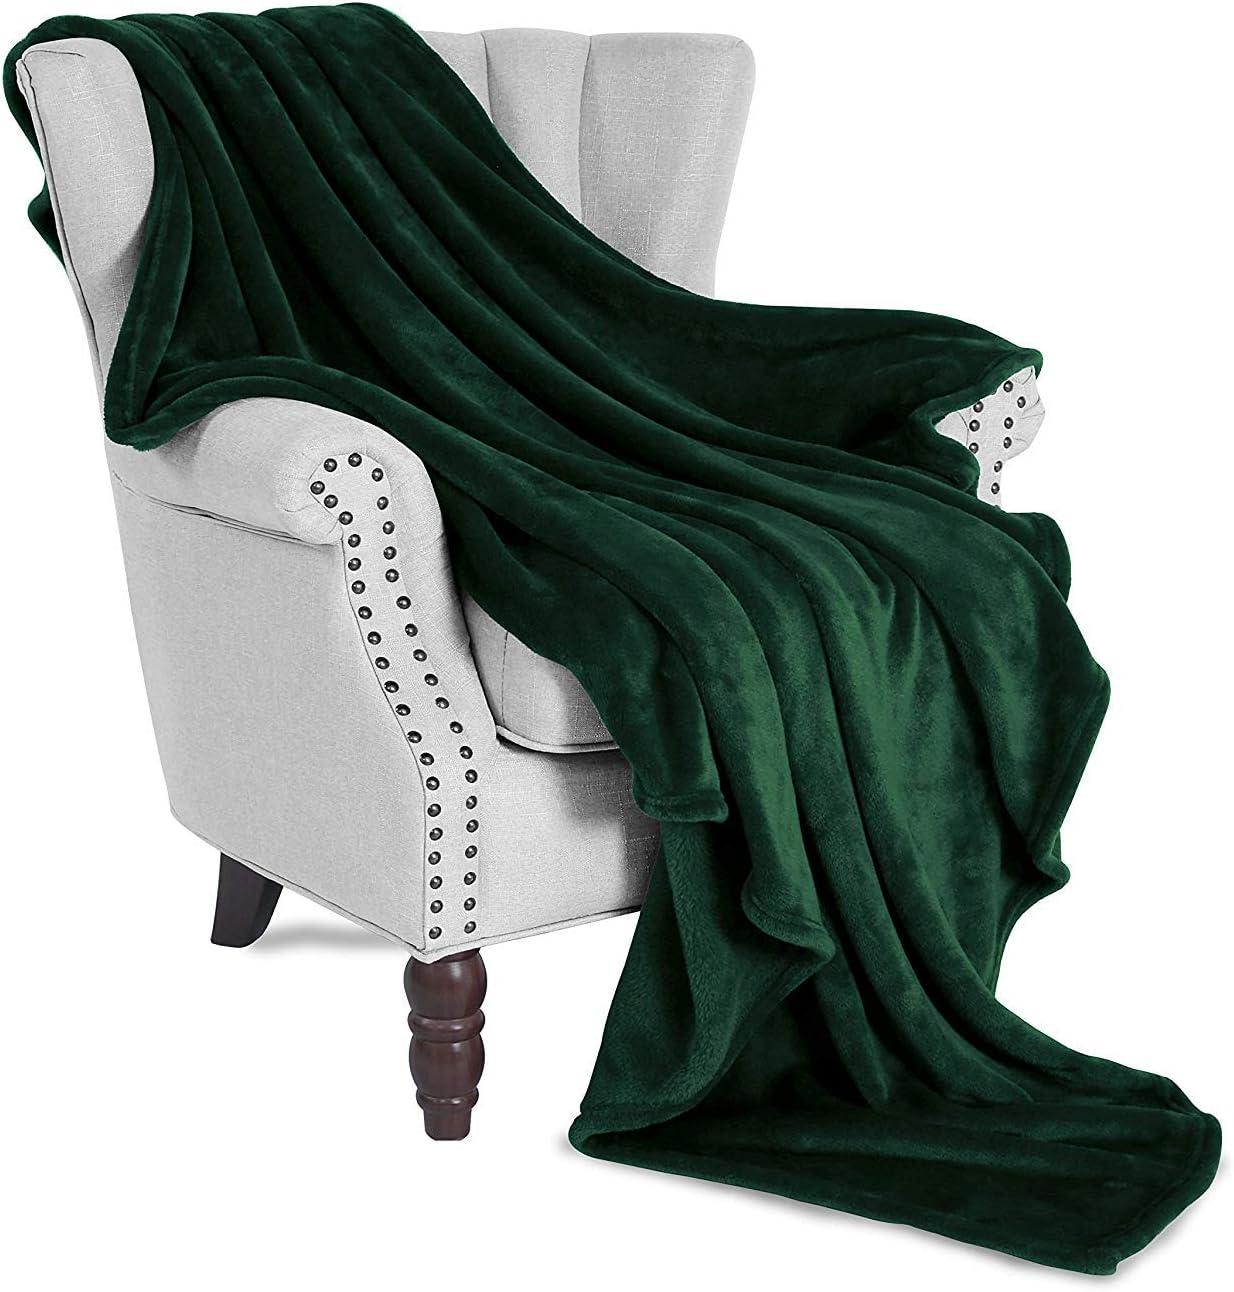 "Exclusivo Mezcla Large Flannel Velvet Plush Throw Blanket - 50"" x 70"" (Forest Green)"